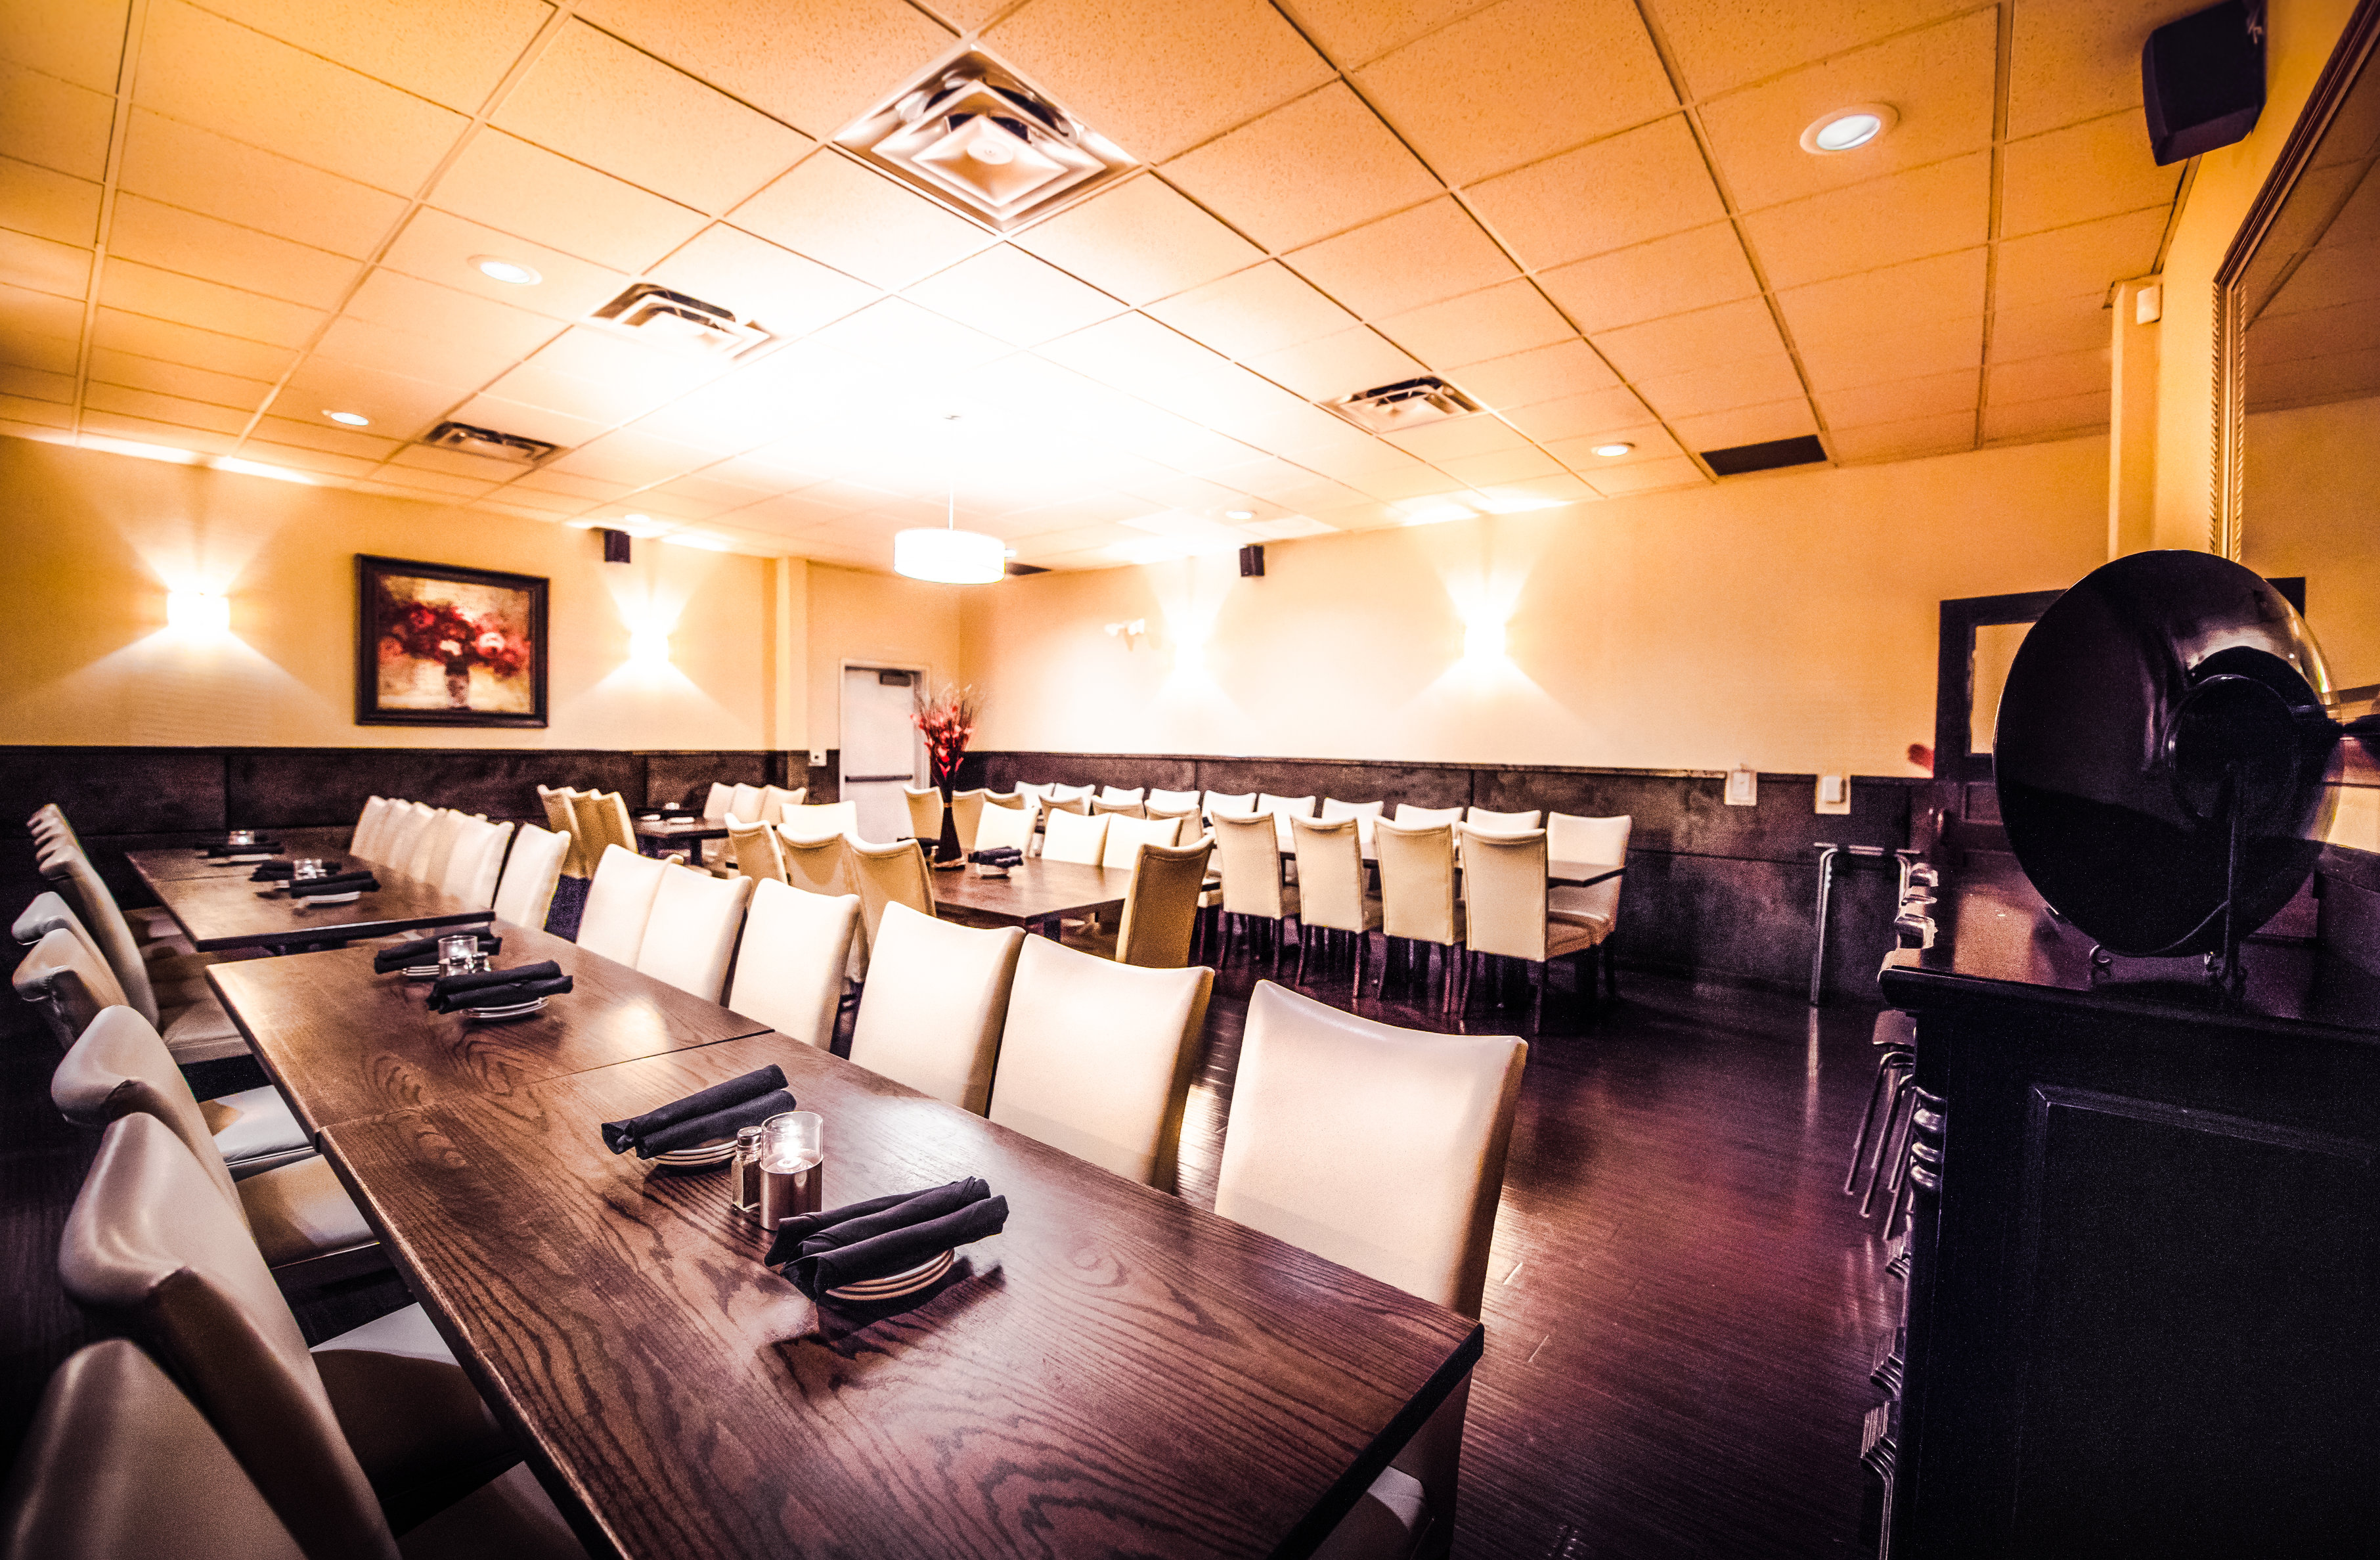 darfons-restaurant-banquet-room-5r